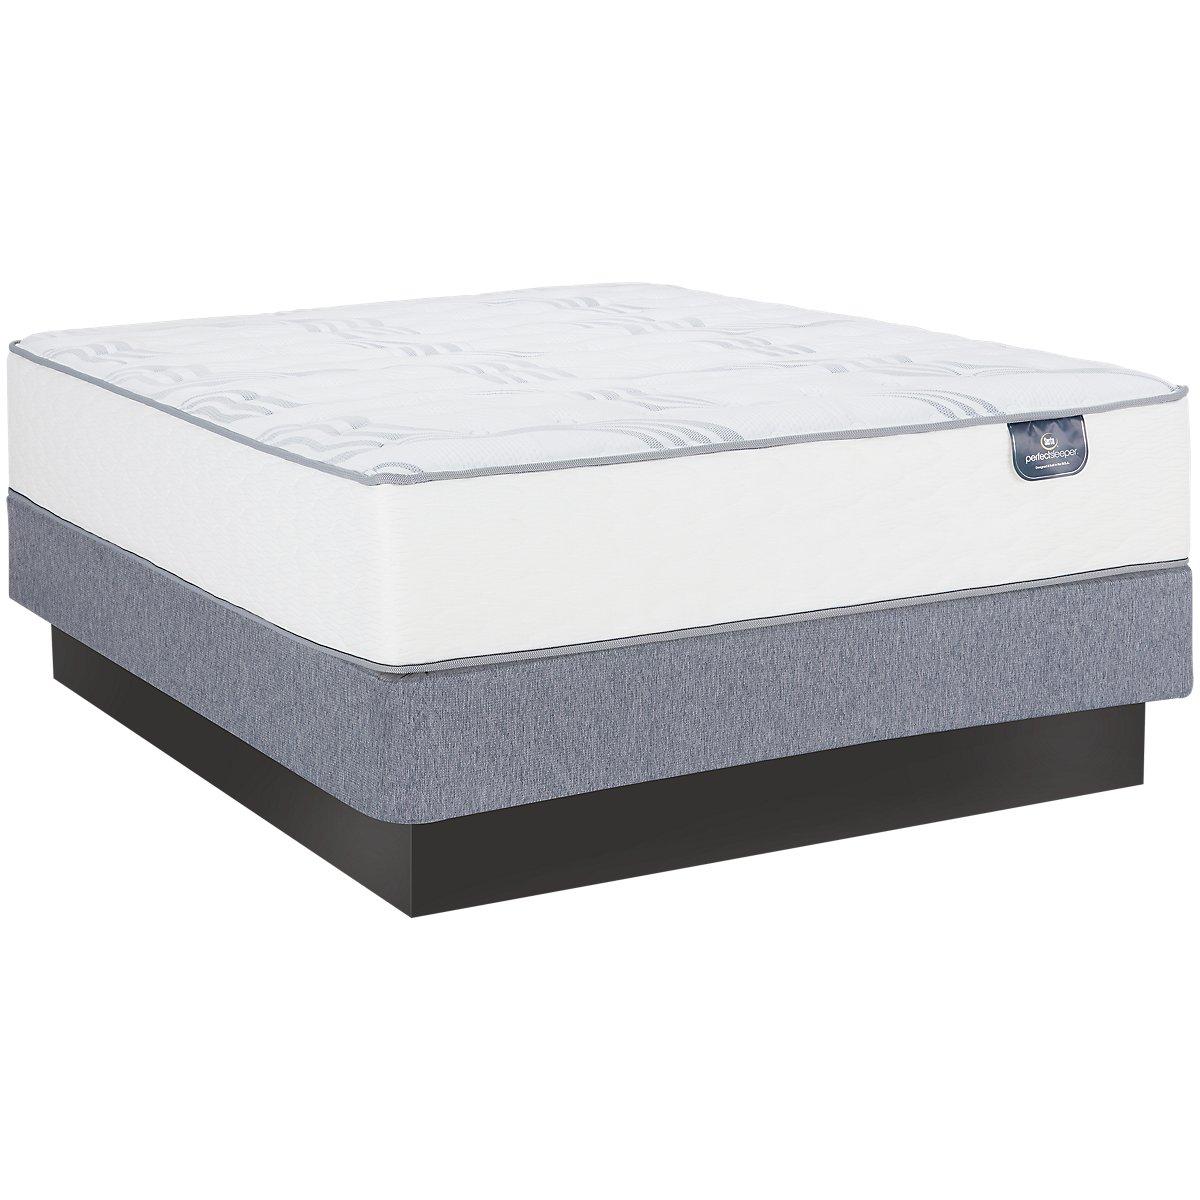 Serta Perfect Sleeper Blomquist Luxury Firm Mattress Set